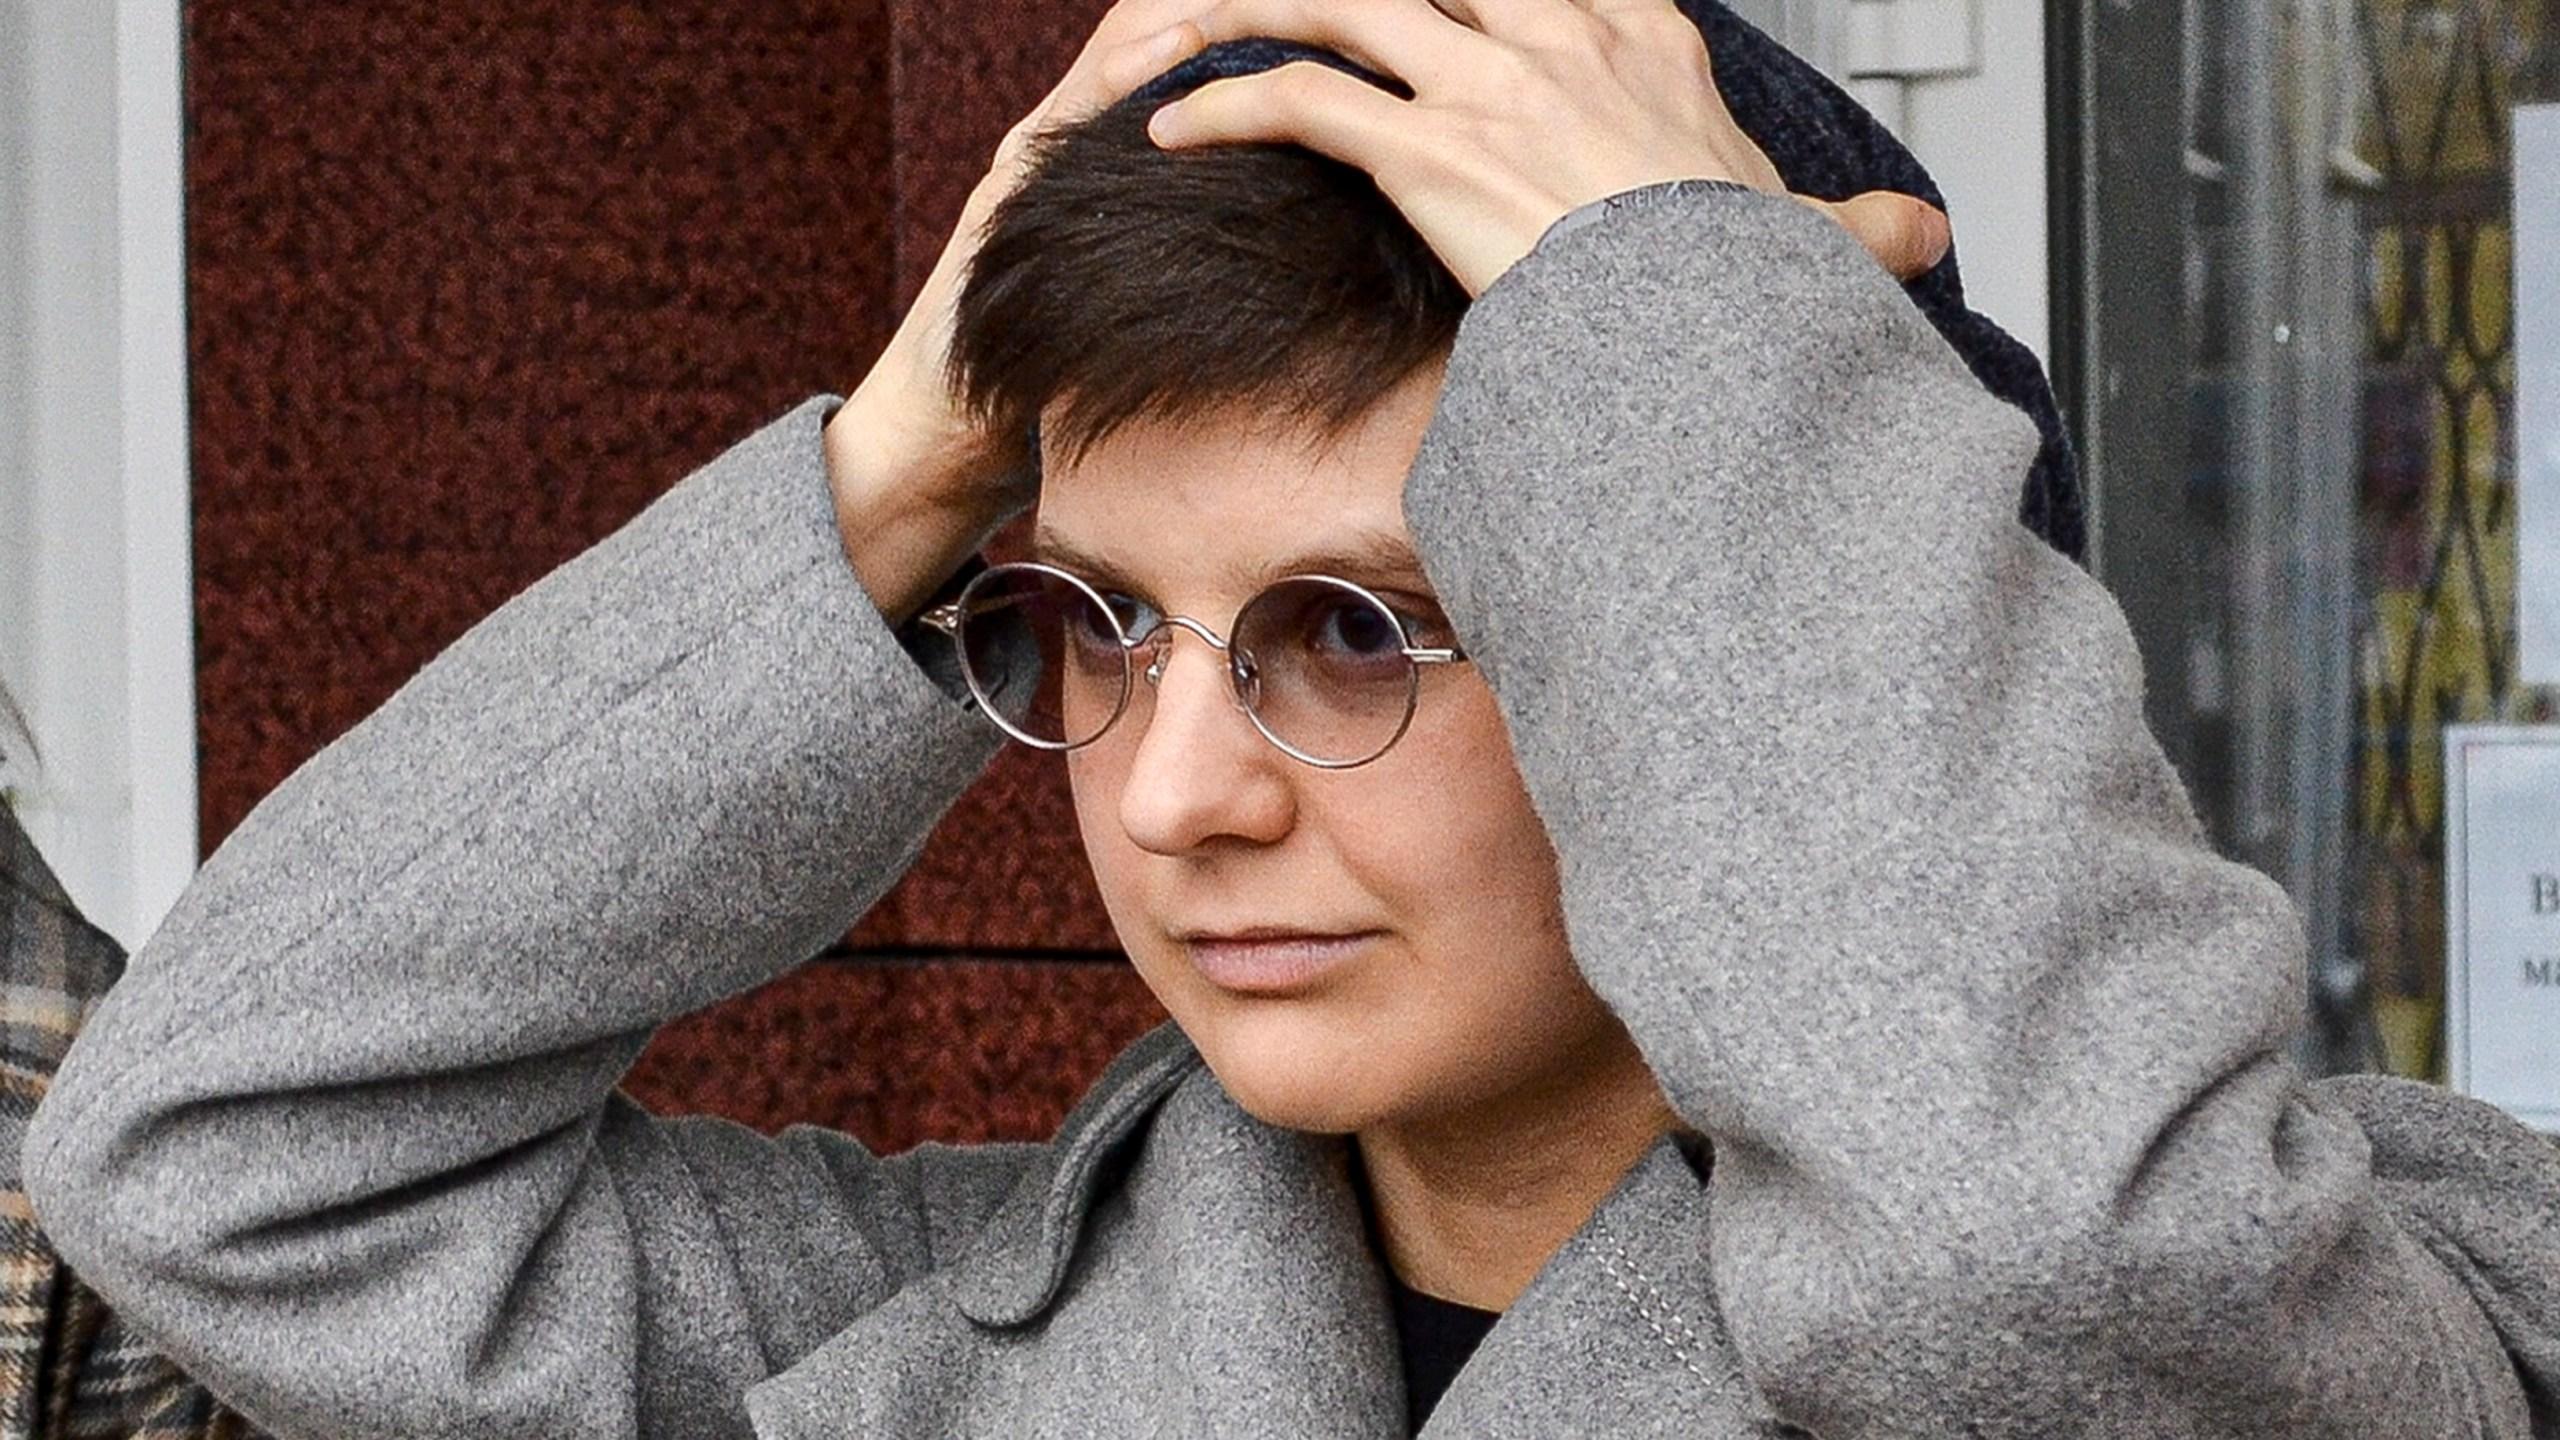 Yulia Tsvetkova